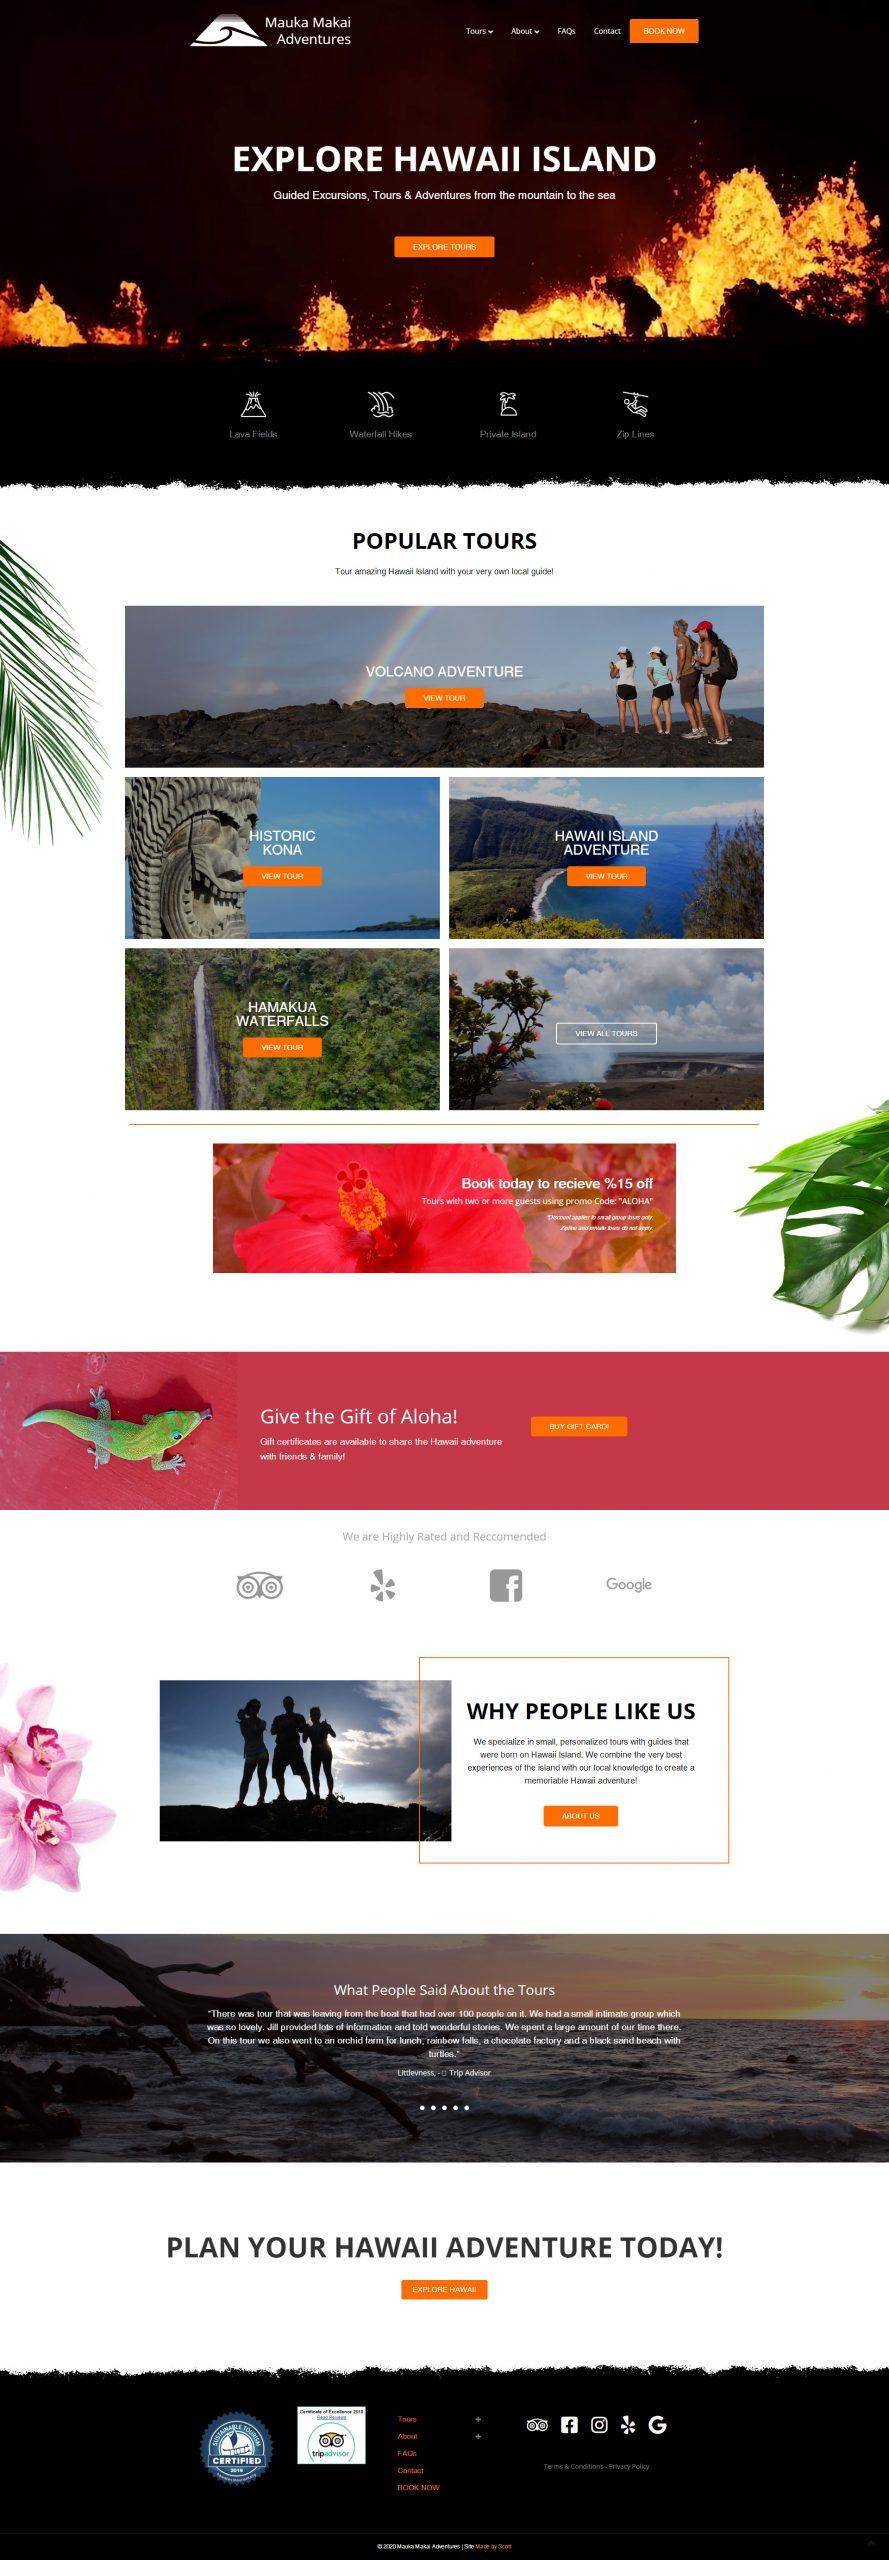 screencapture-maukamakai-madebyscott-2020-03-25-09_48_11